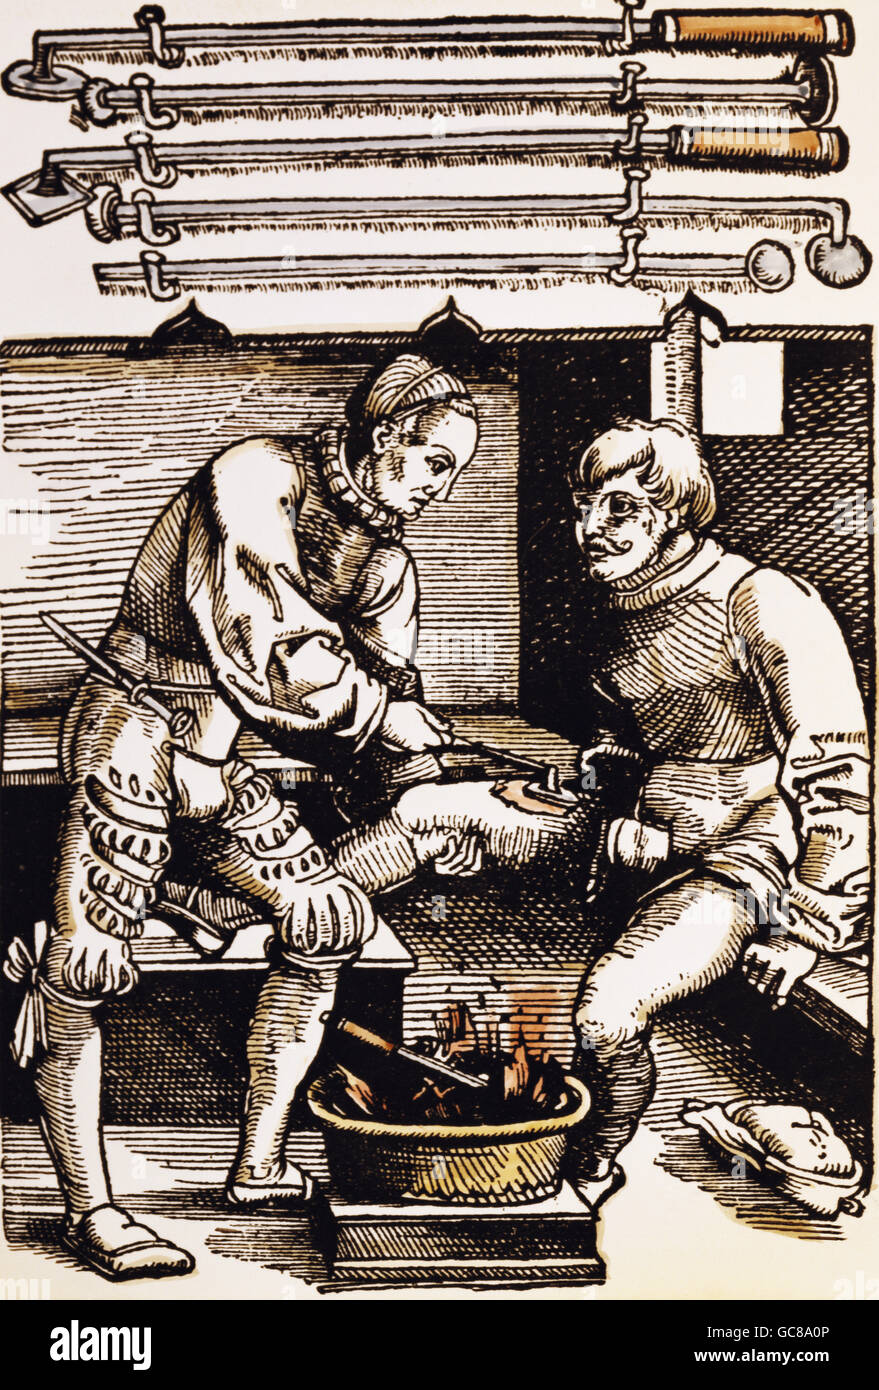 medicine, treatment, cauterization, woodcut, coloured, from 'Feldtbuch der Wundartzney', by Hans von Gersdorff, - Stock Image